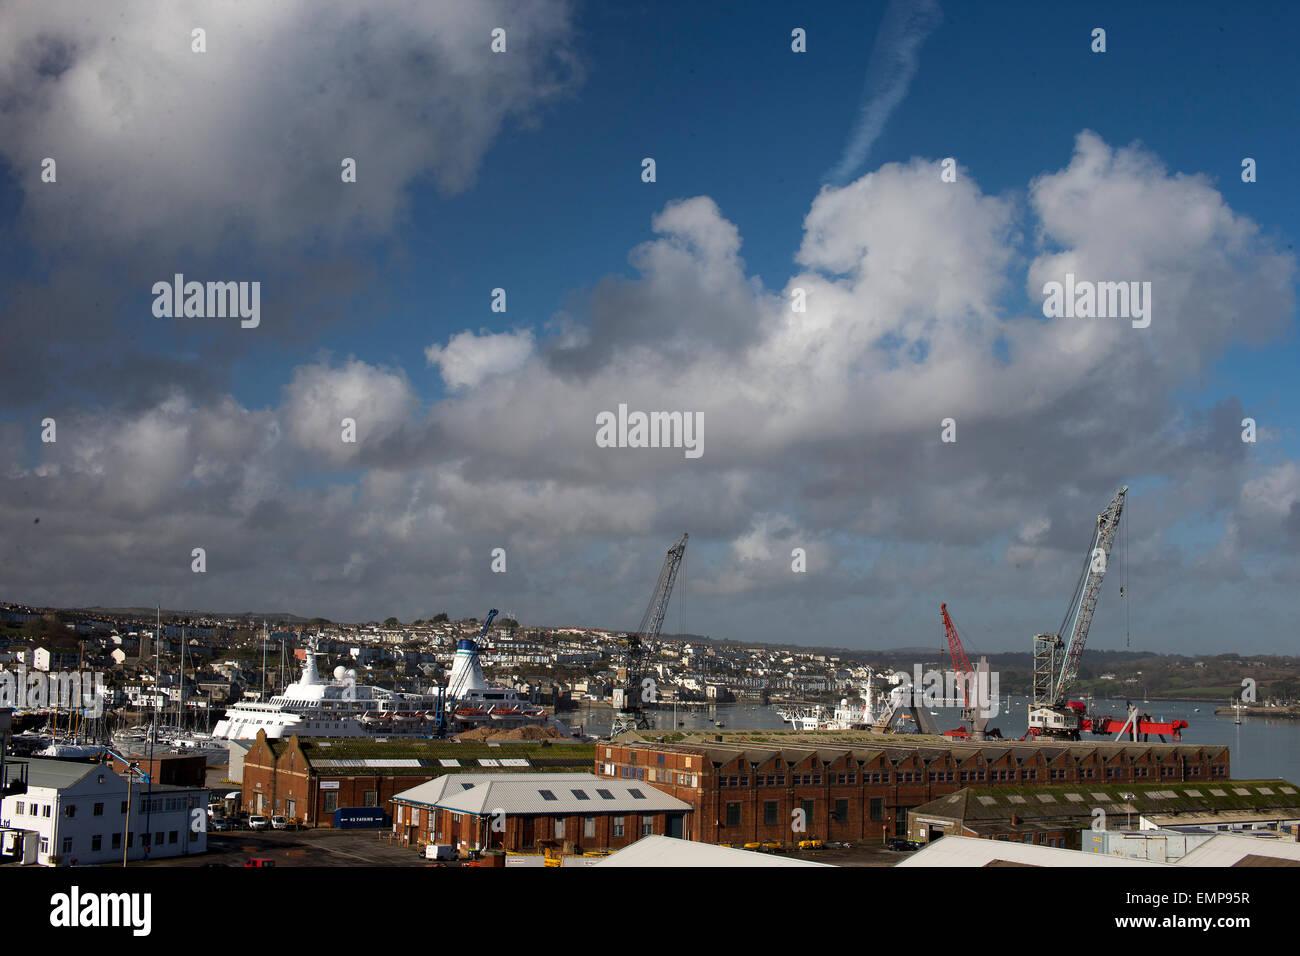 View over Falmouth dockyard, Cornwall, England, UK. Stock Photo